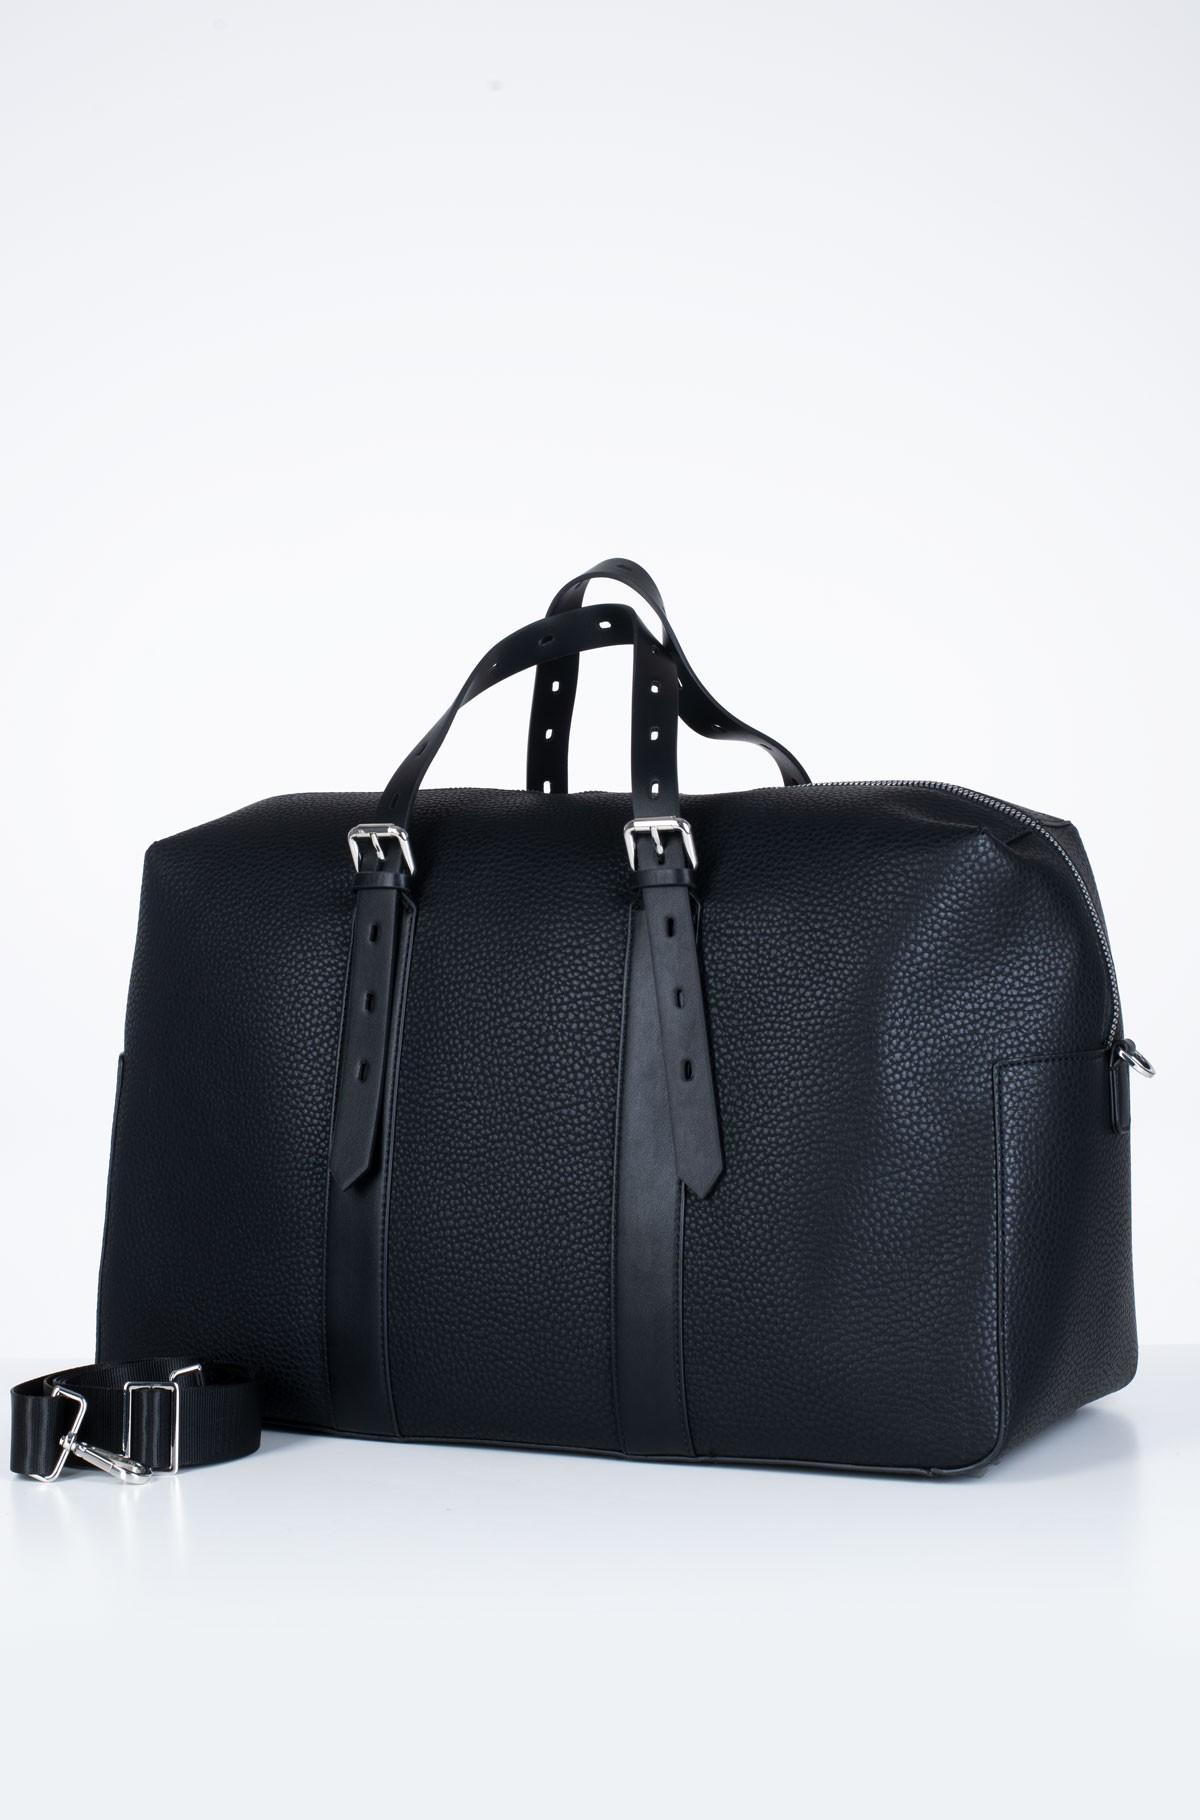 Kelionių krepšys TMDANP P0235-full-2